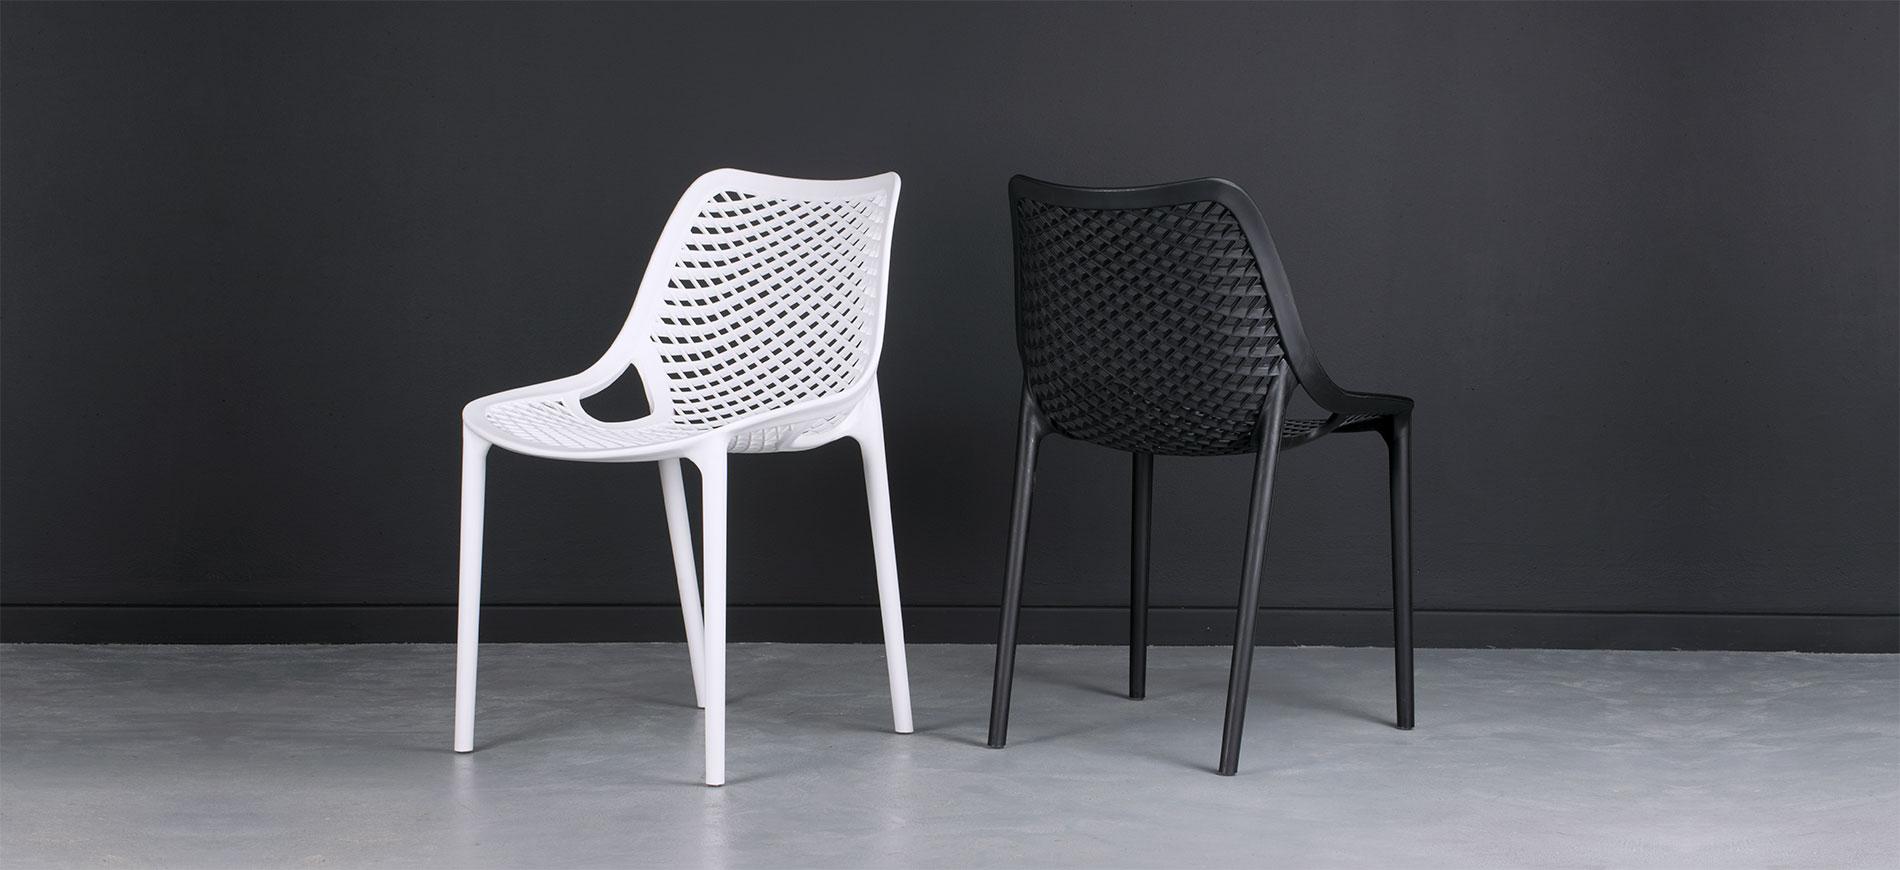 see the Amalfi chair